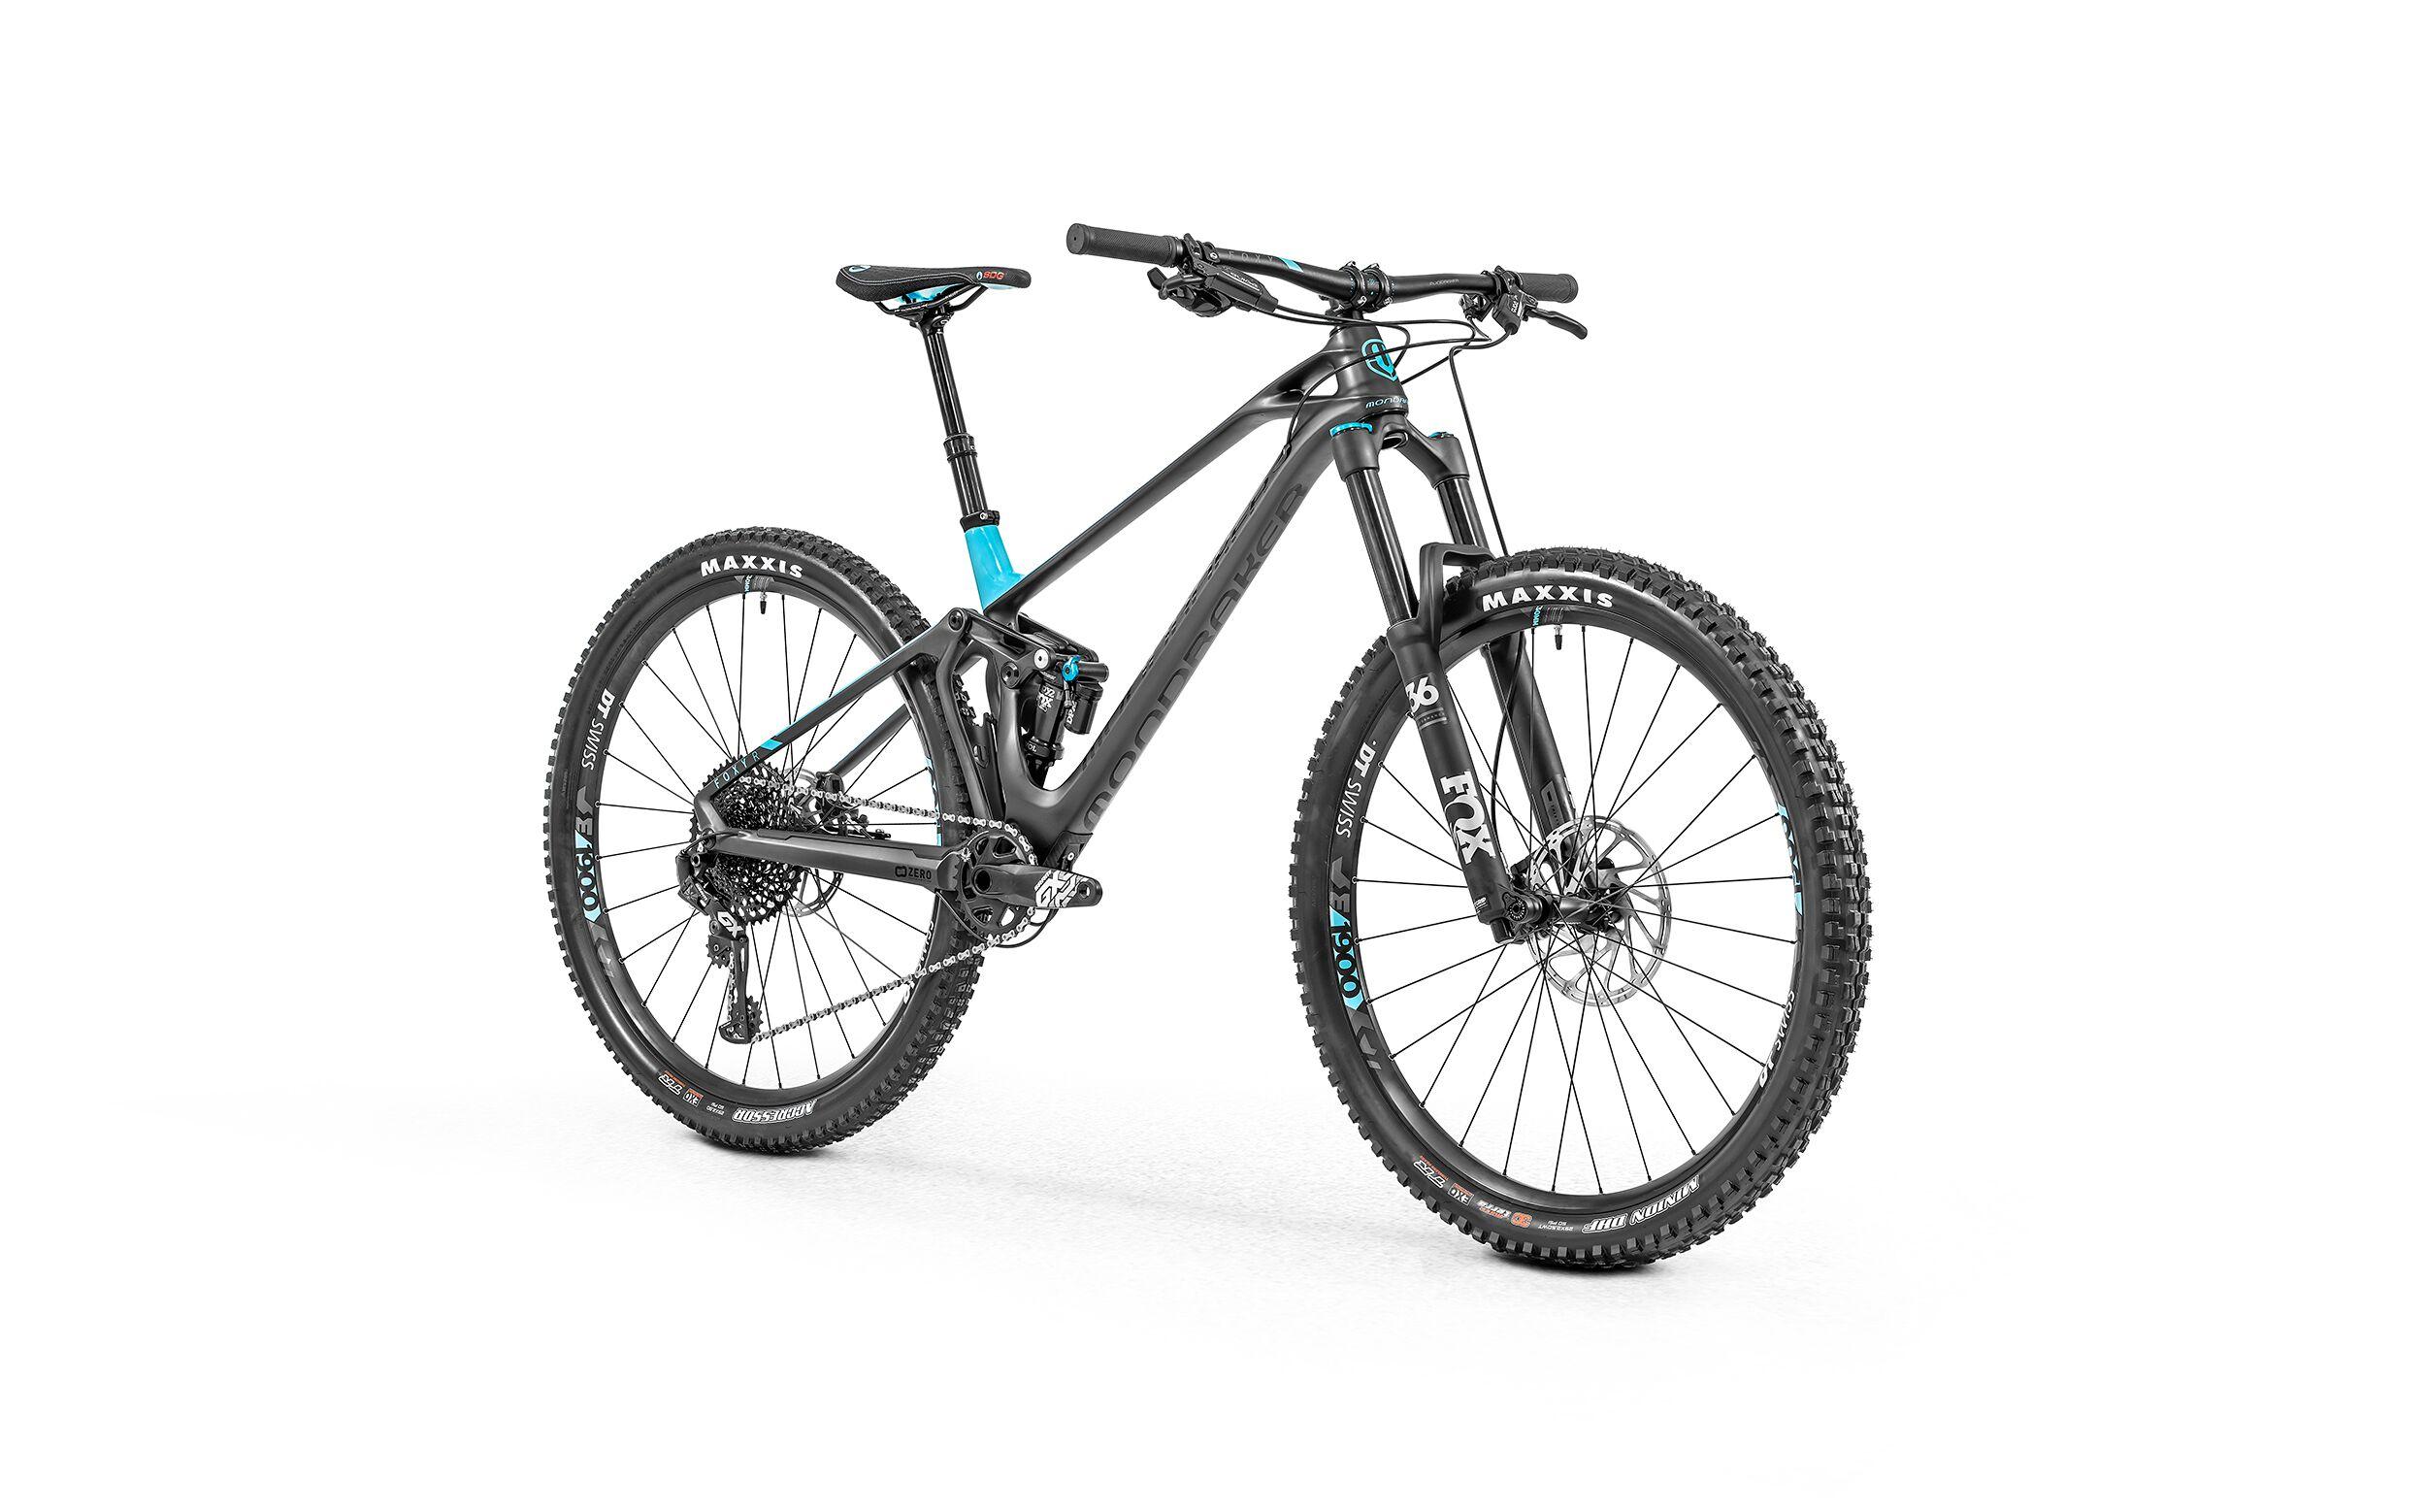 Mondraker Foxy Carbon R 29 All Mountain Enduro Bike